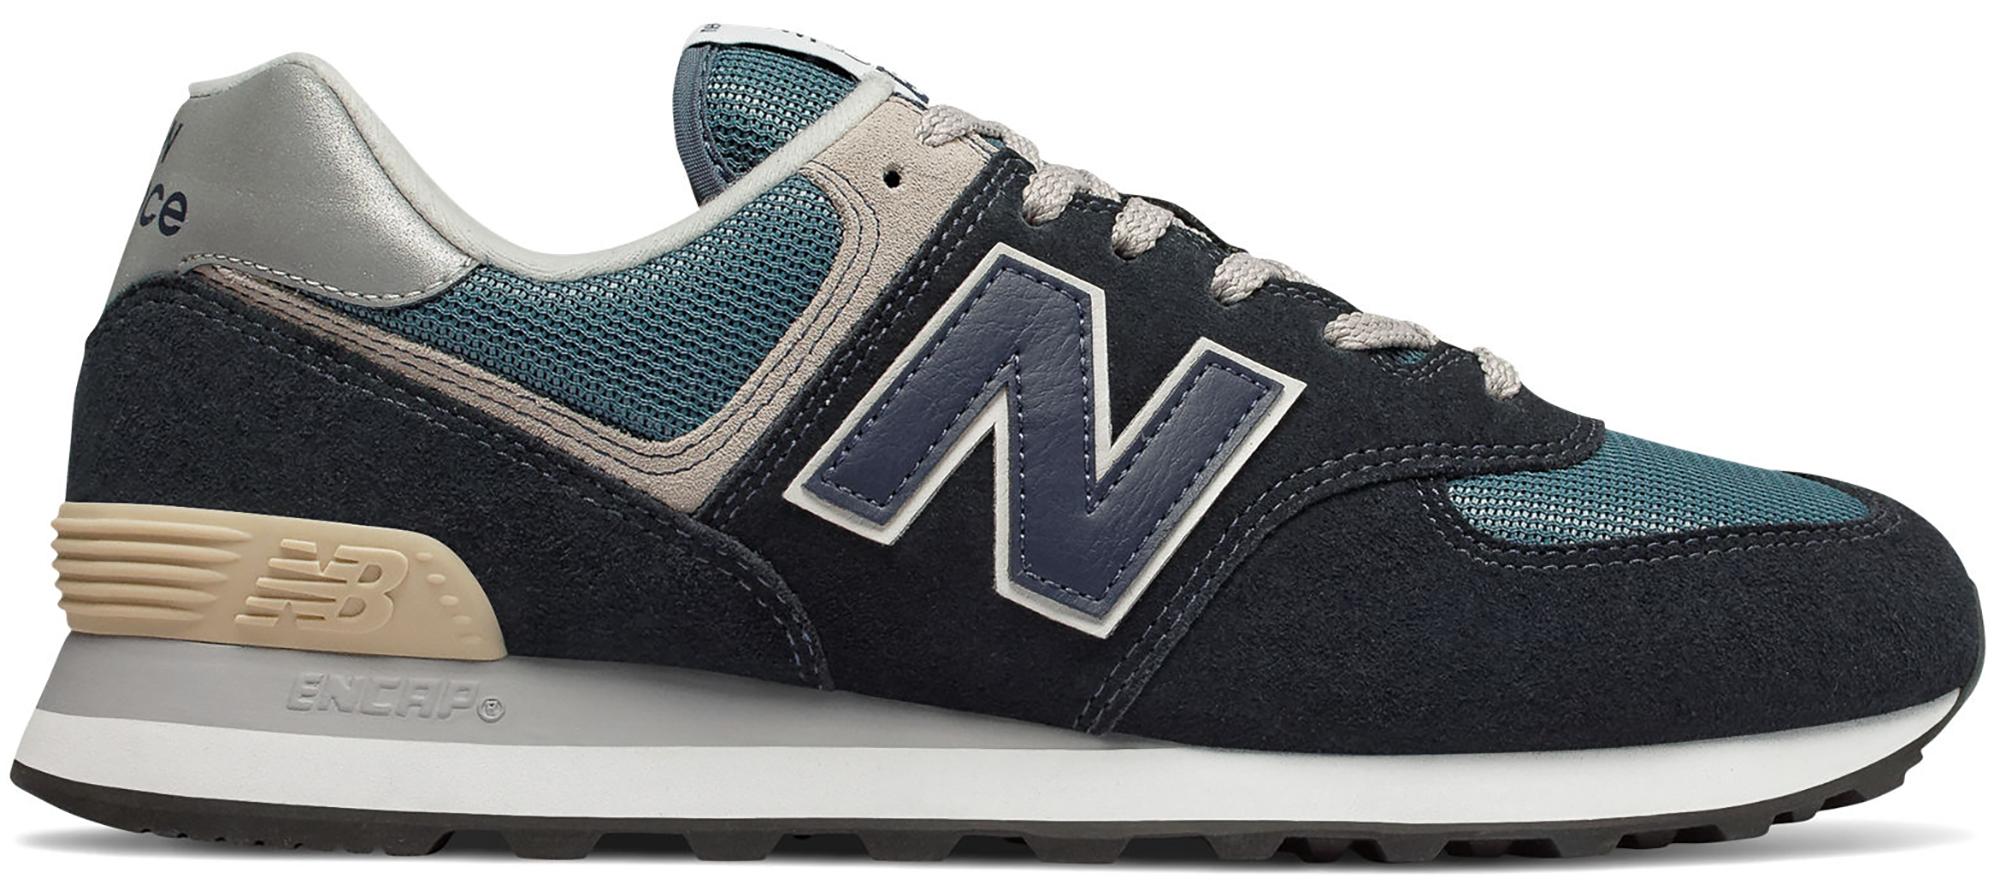 New Balance 574 Dark Navy Marred Blue